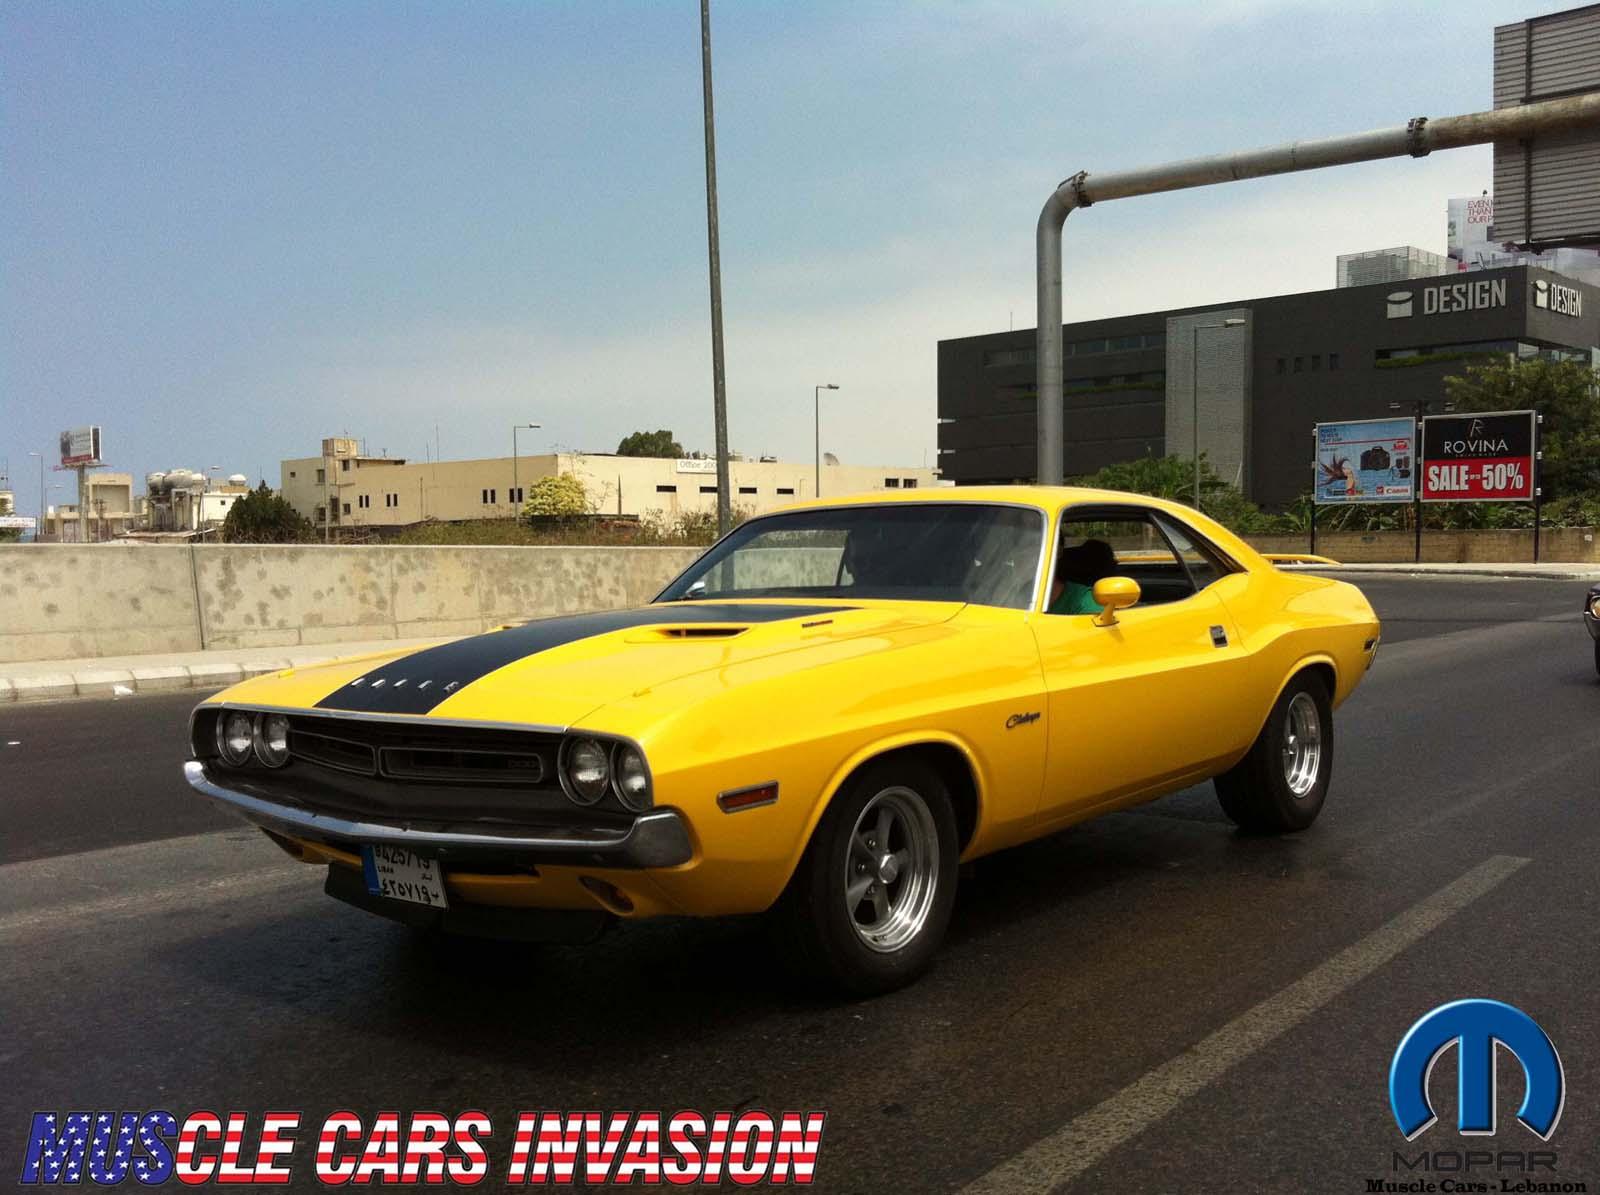 Mega Gallery: American Muscle Cars Cruise - Marina Dbaye to Ras Al ...